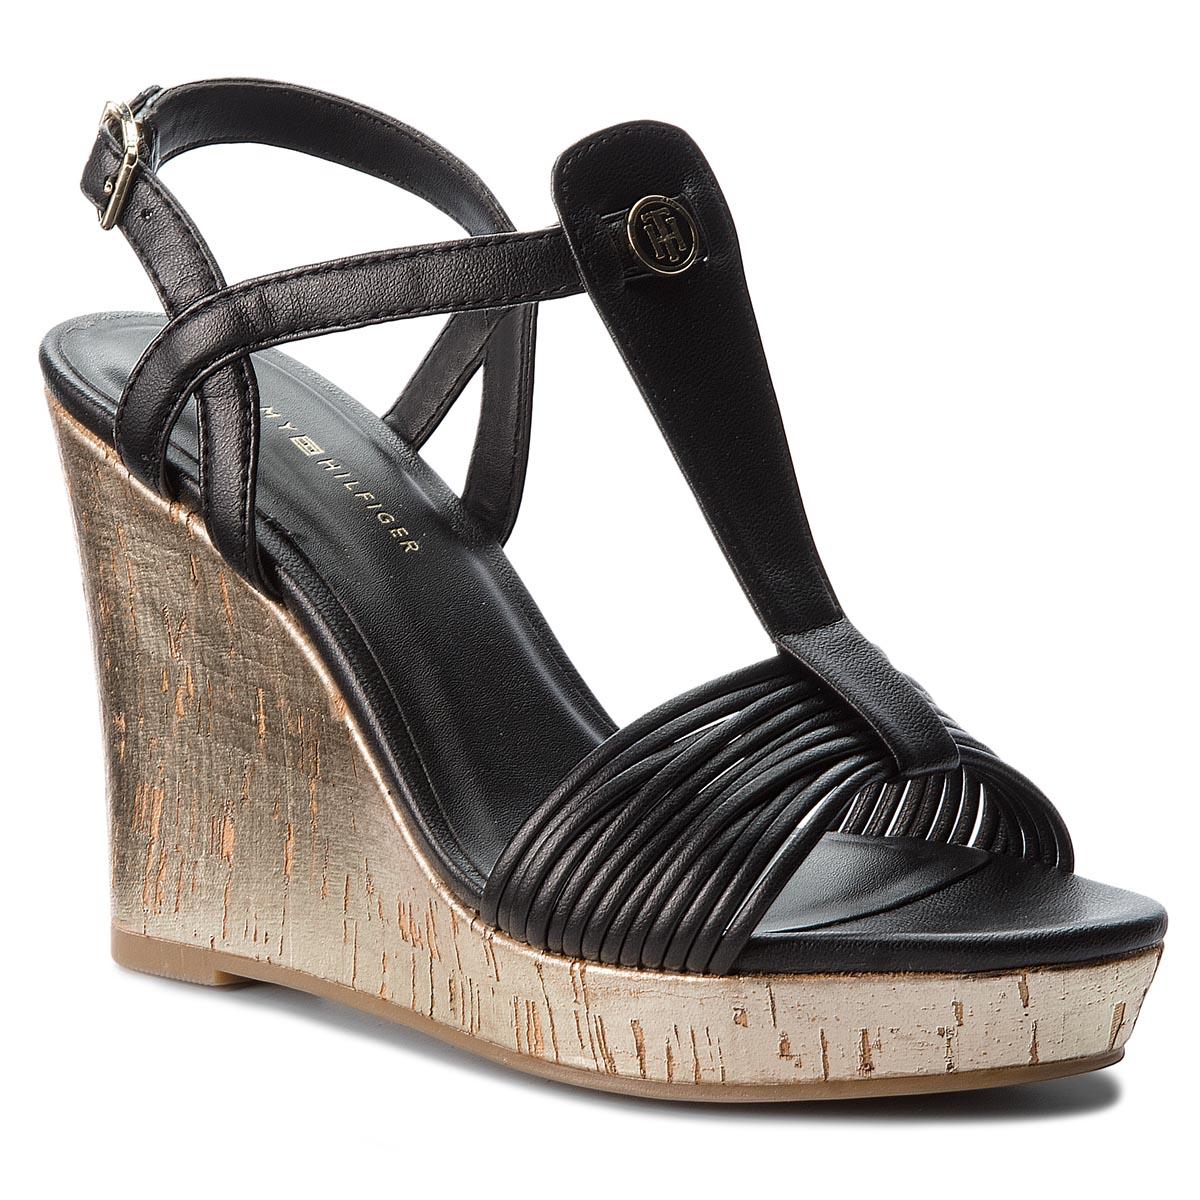 92a8ab4c5fc23 Sandals TOMMY HILFIGER Refined Strappy Wedge Sandal FW0FW03023 Black 990